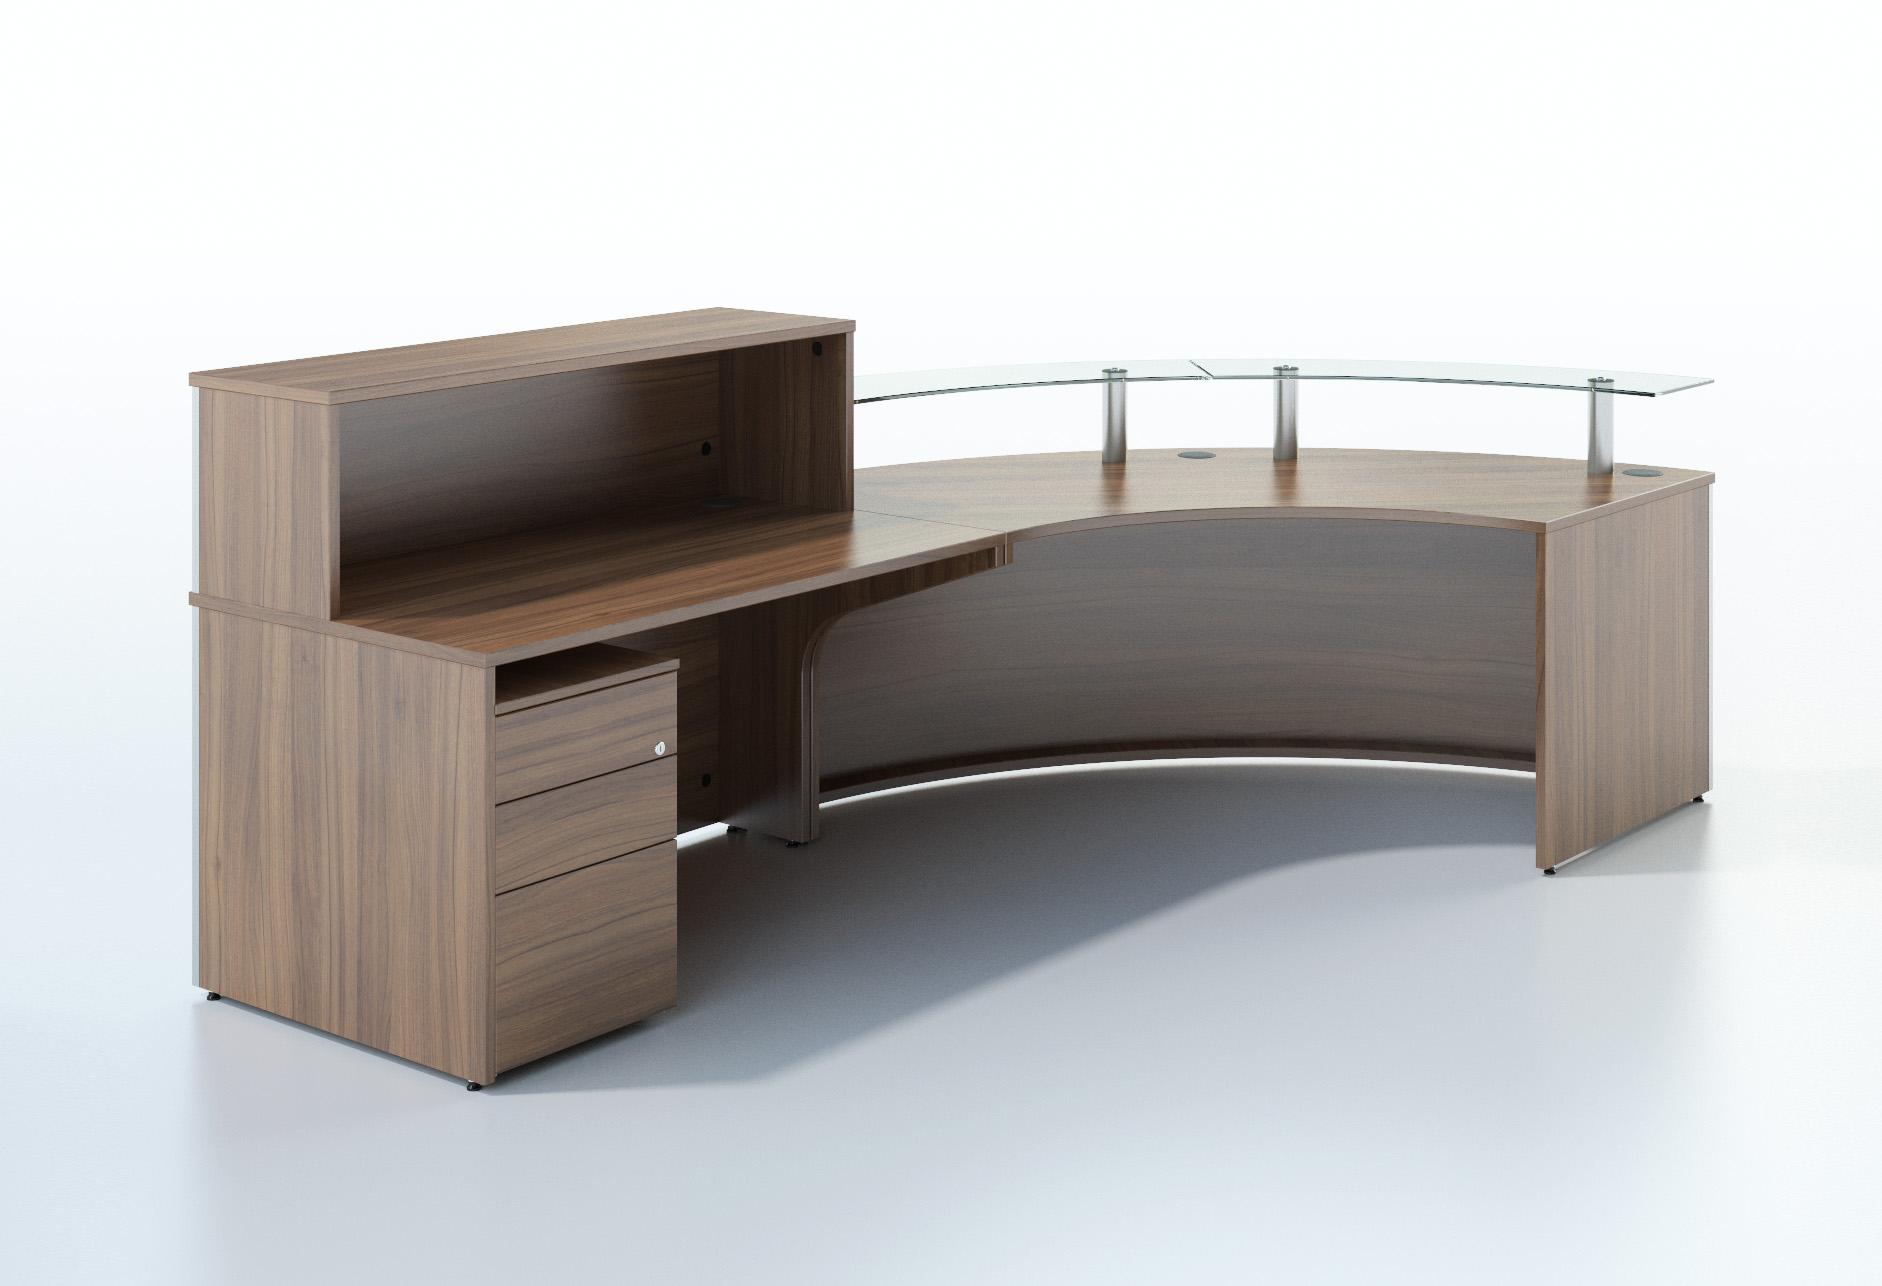 Reception-mid-level-IMAGE 41